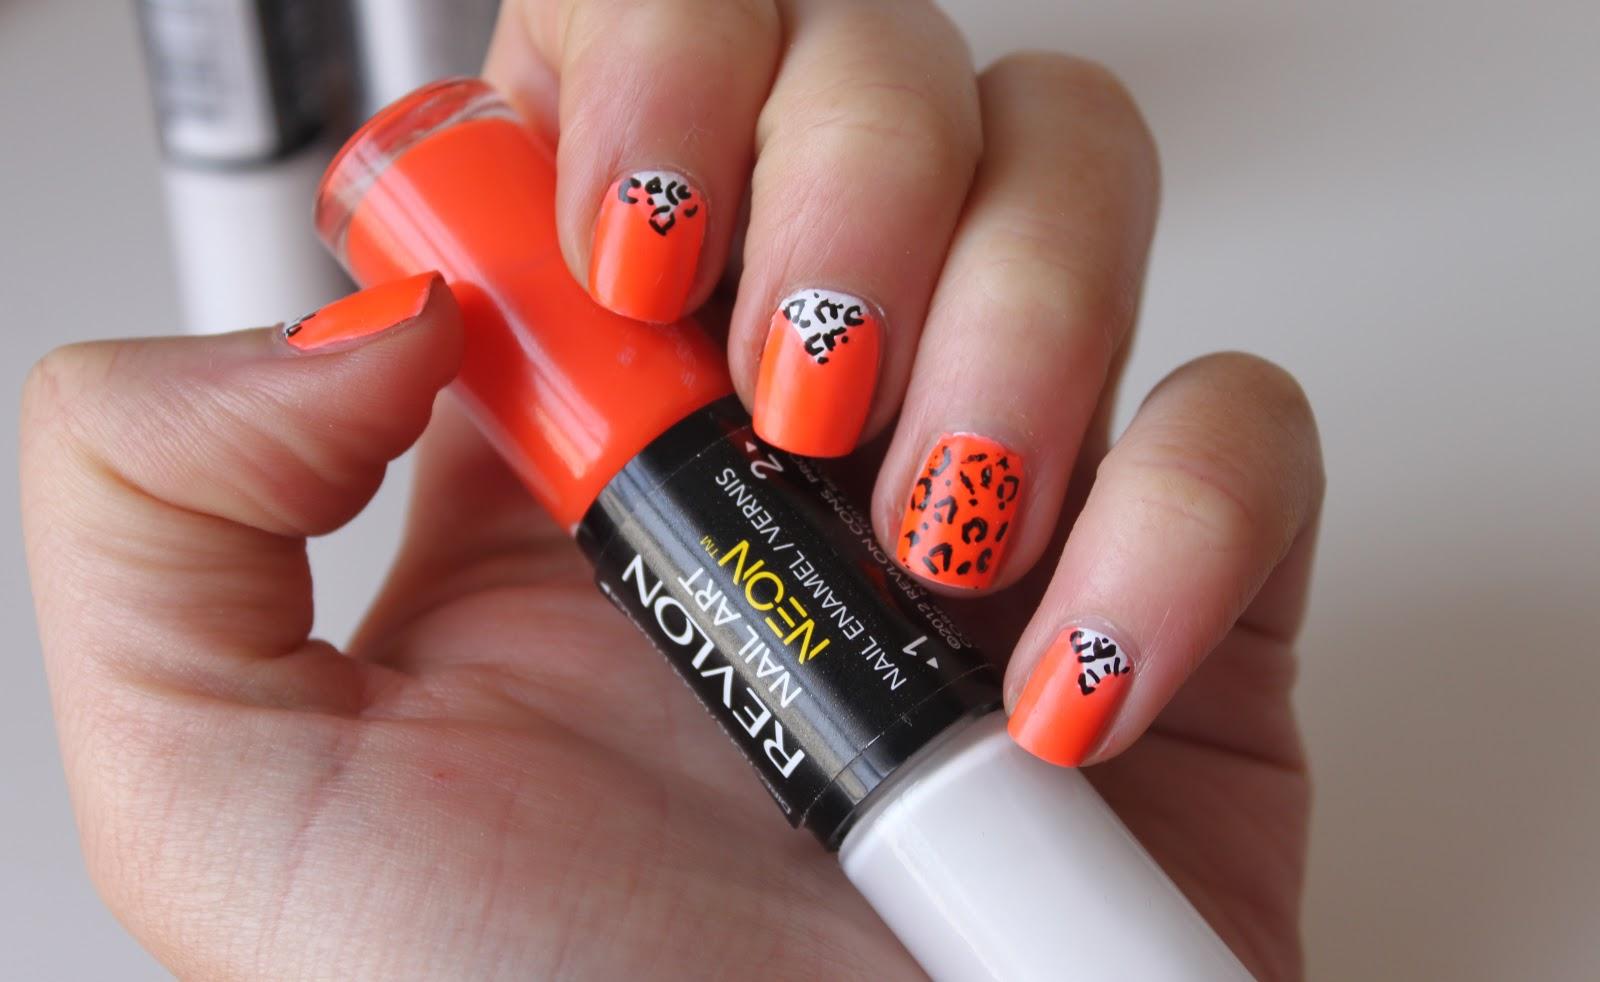 Revlon nail art pens nail art idea a little obsessed revlon nail art pens nail art idea prinsesfo Images